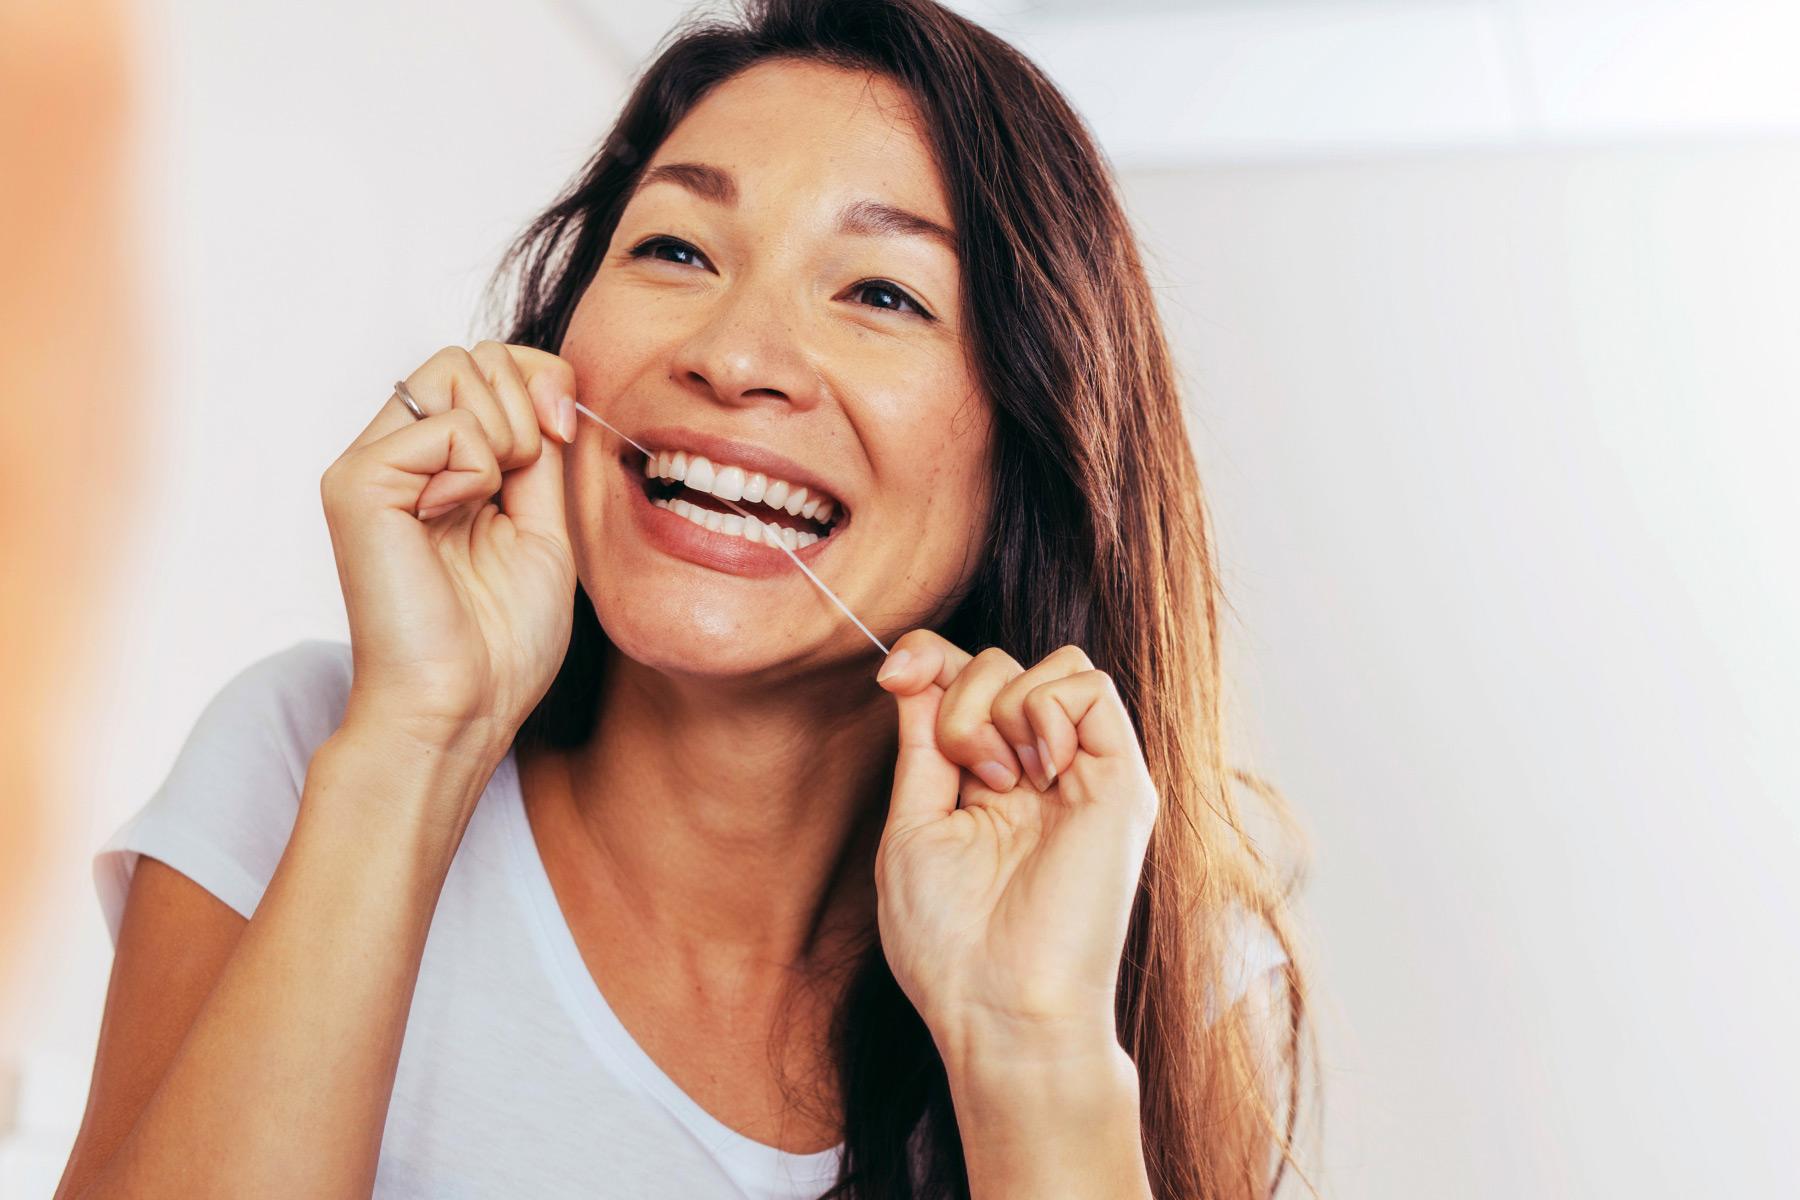 photo of woman flossing her teeth